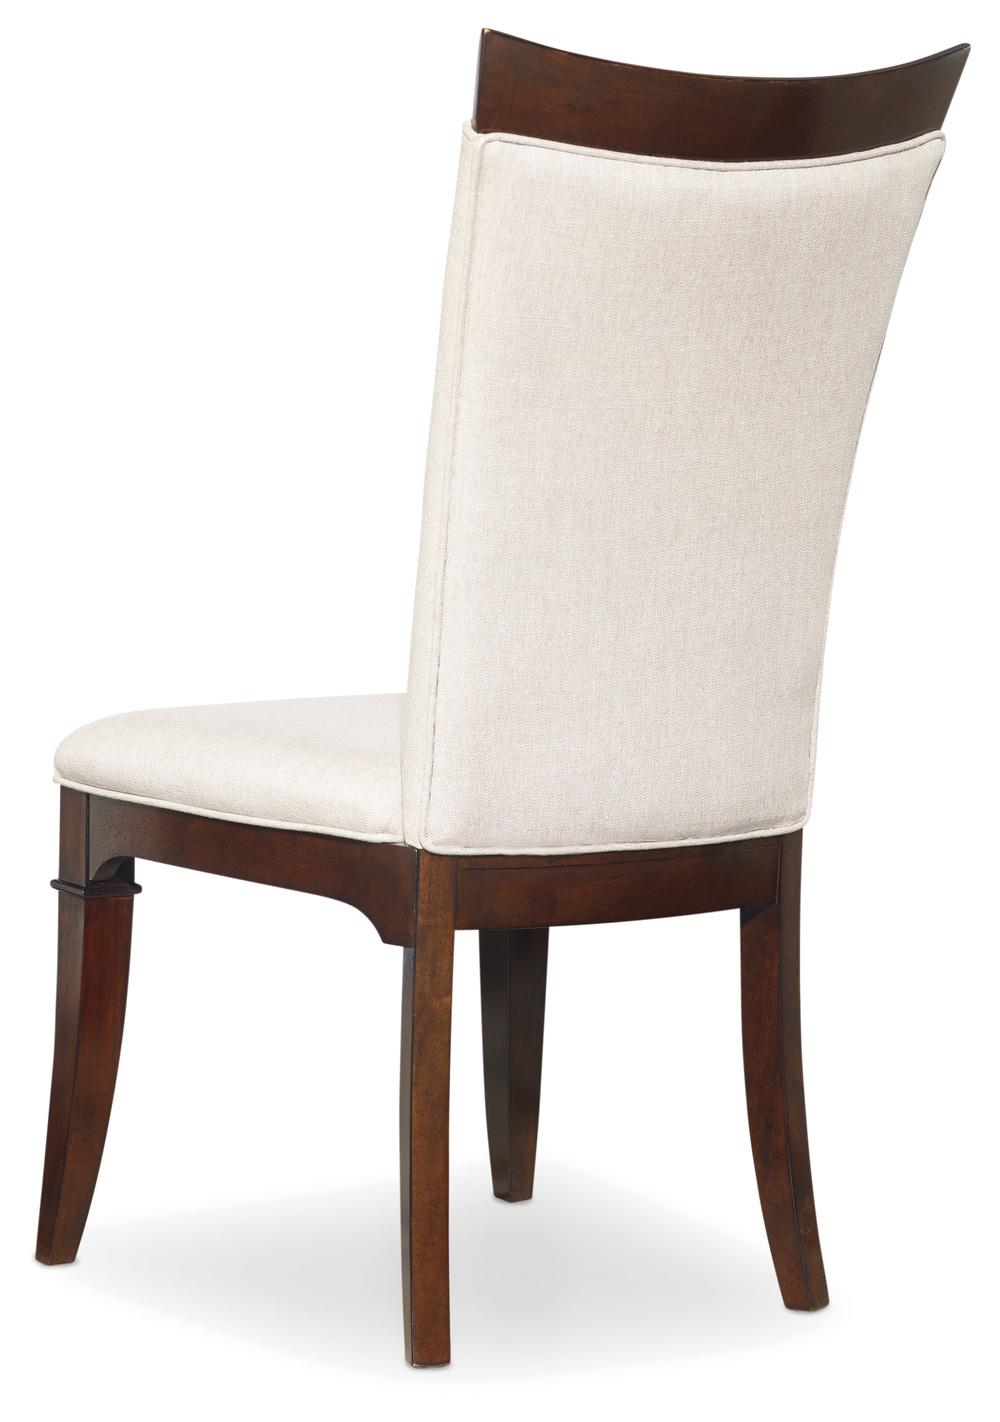 Hooker Furniture - Palisade Upholstered Side Chair